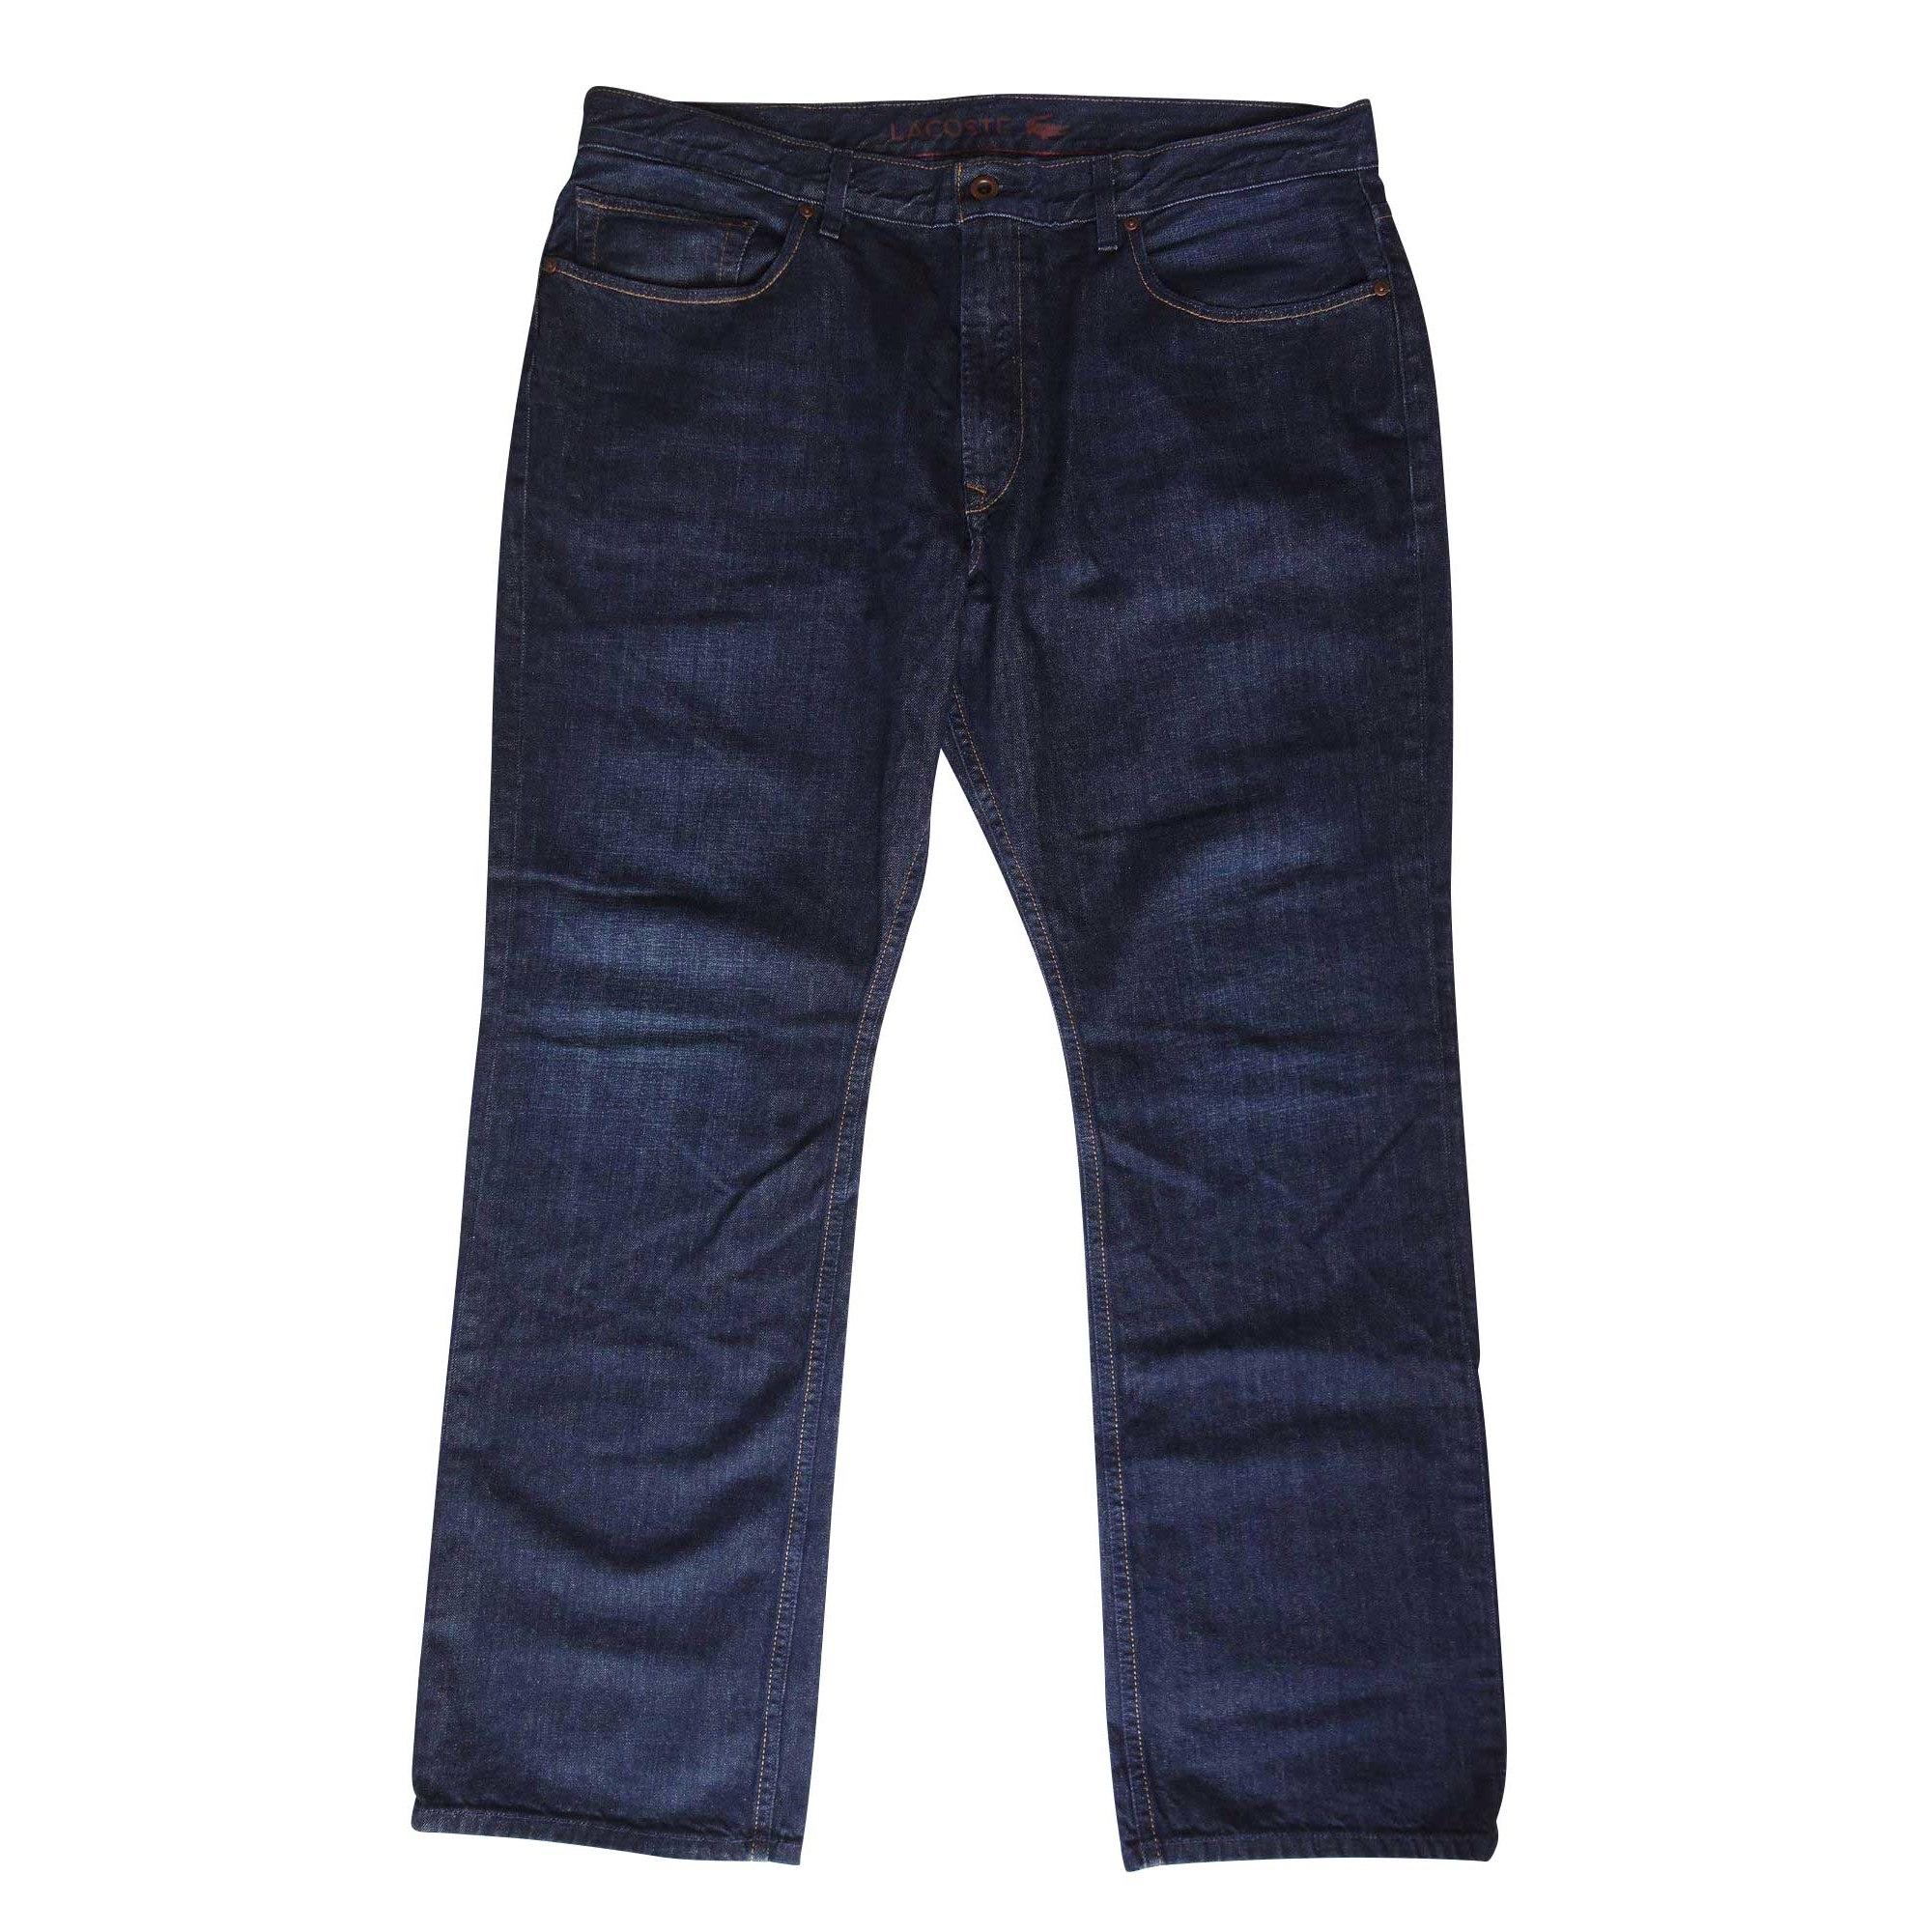 Jeans droit LACOSTE Bleu, bleu marine, bleu turquoise